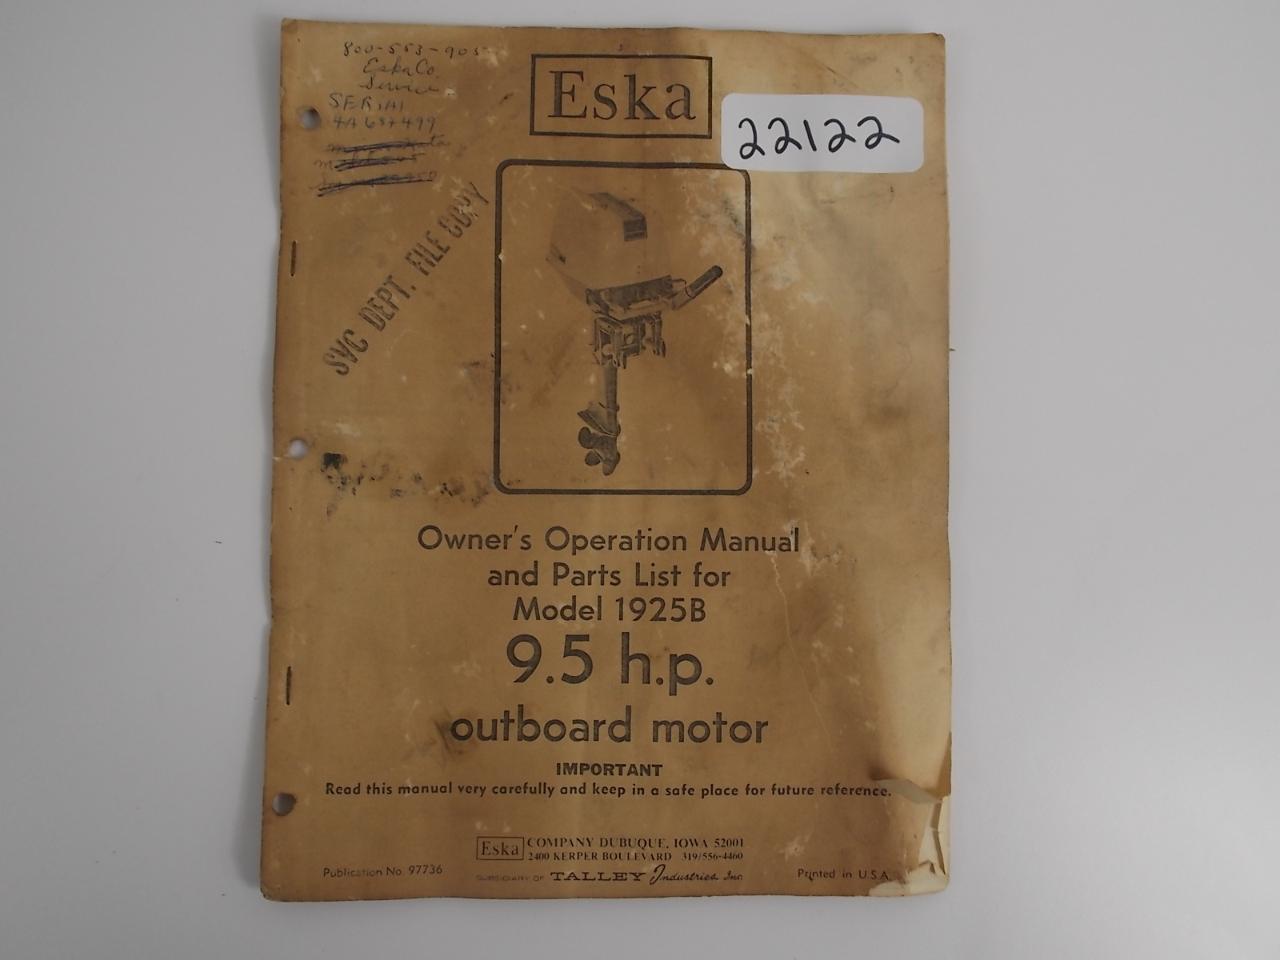 eska owner s operation manual 9 5 hp model 1925b publication 97736 rh southcentraloutboards com Eska Korra Eska Pedal Tractor Parts